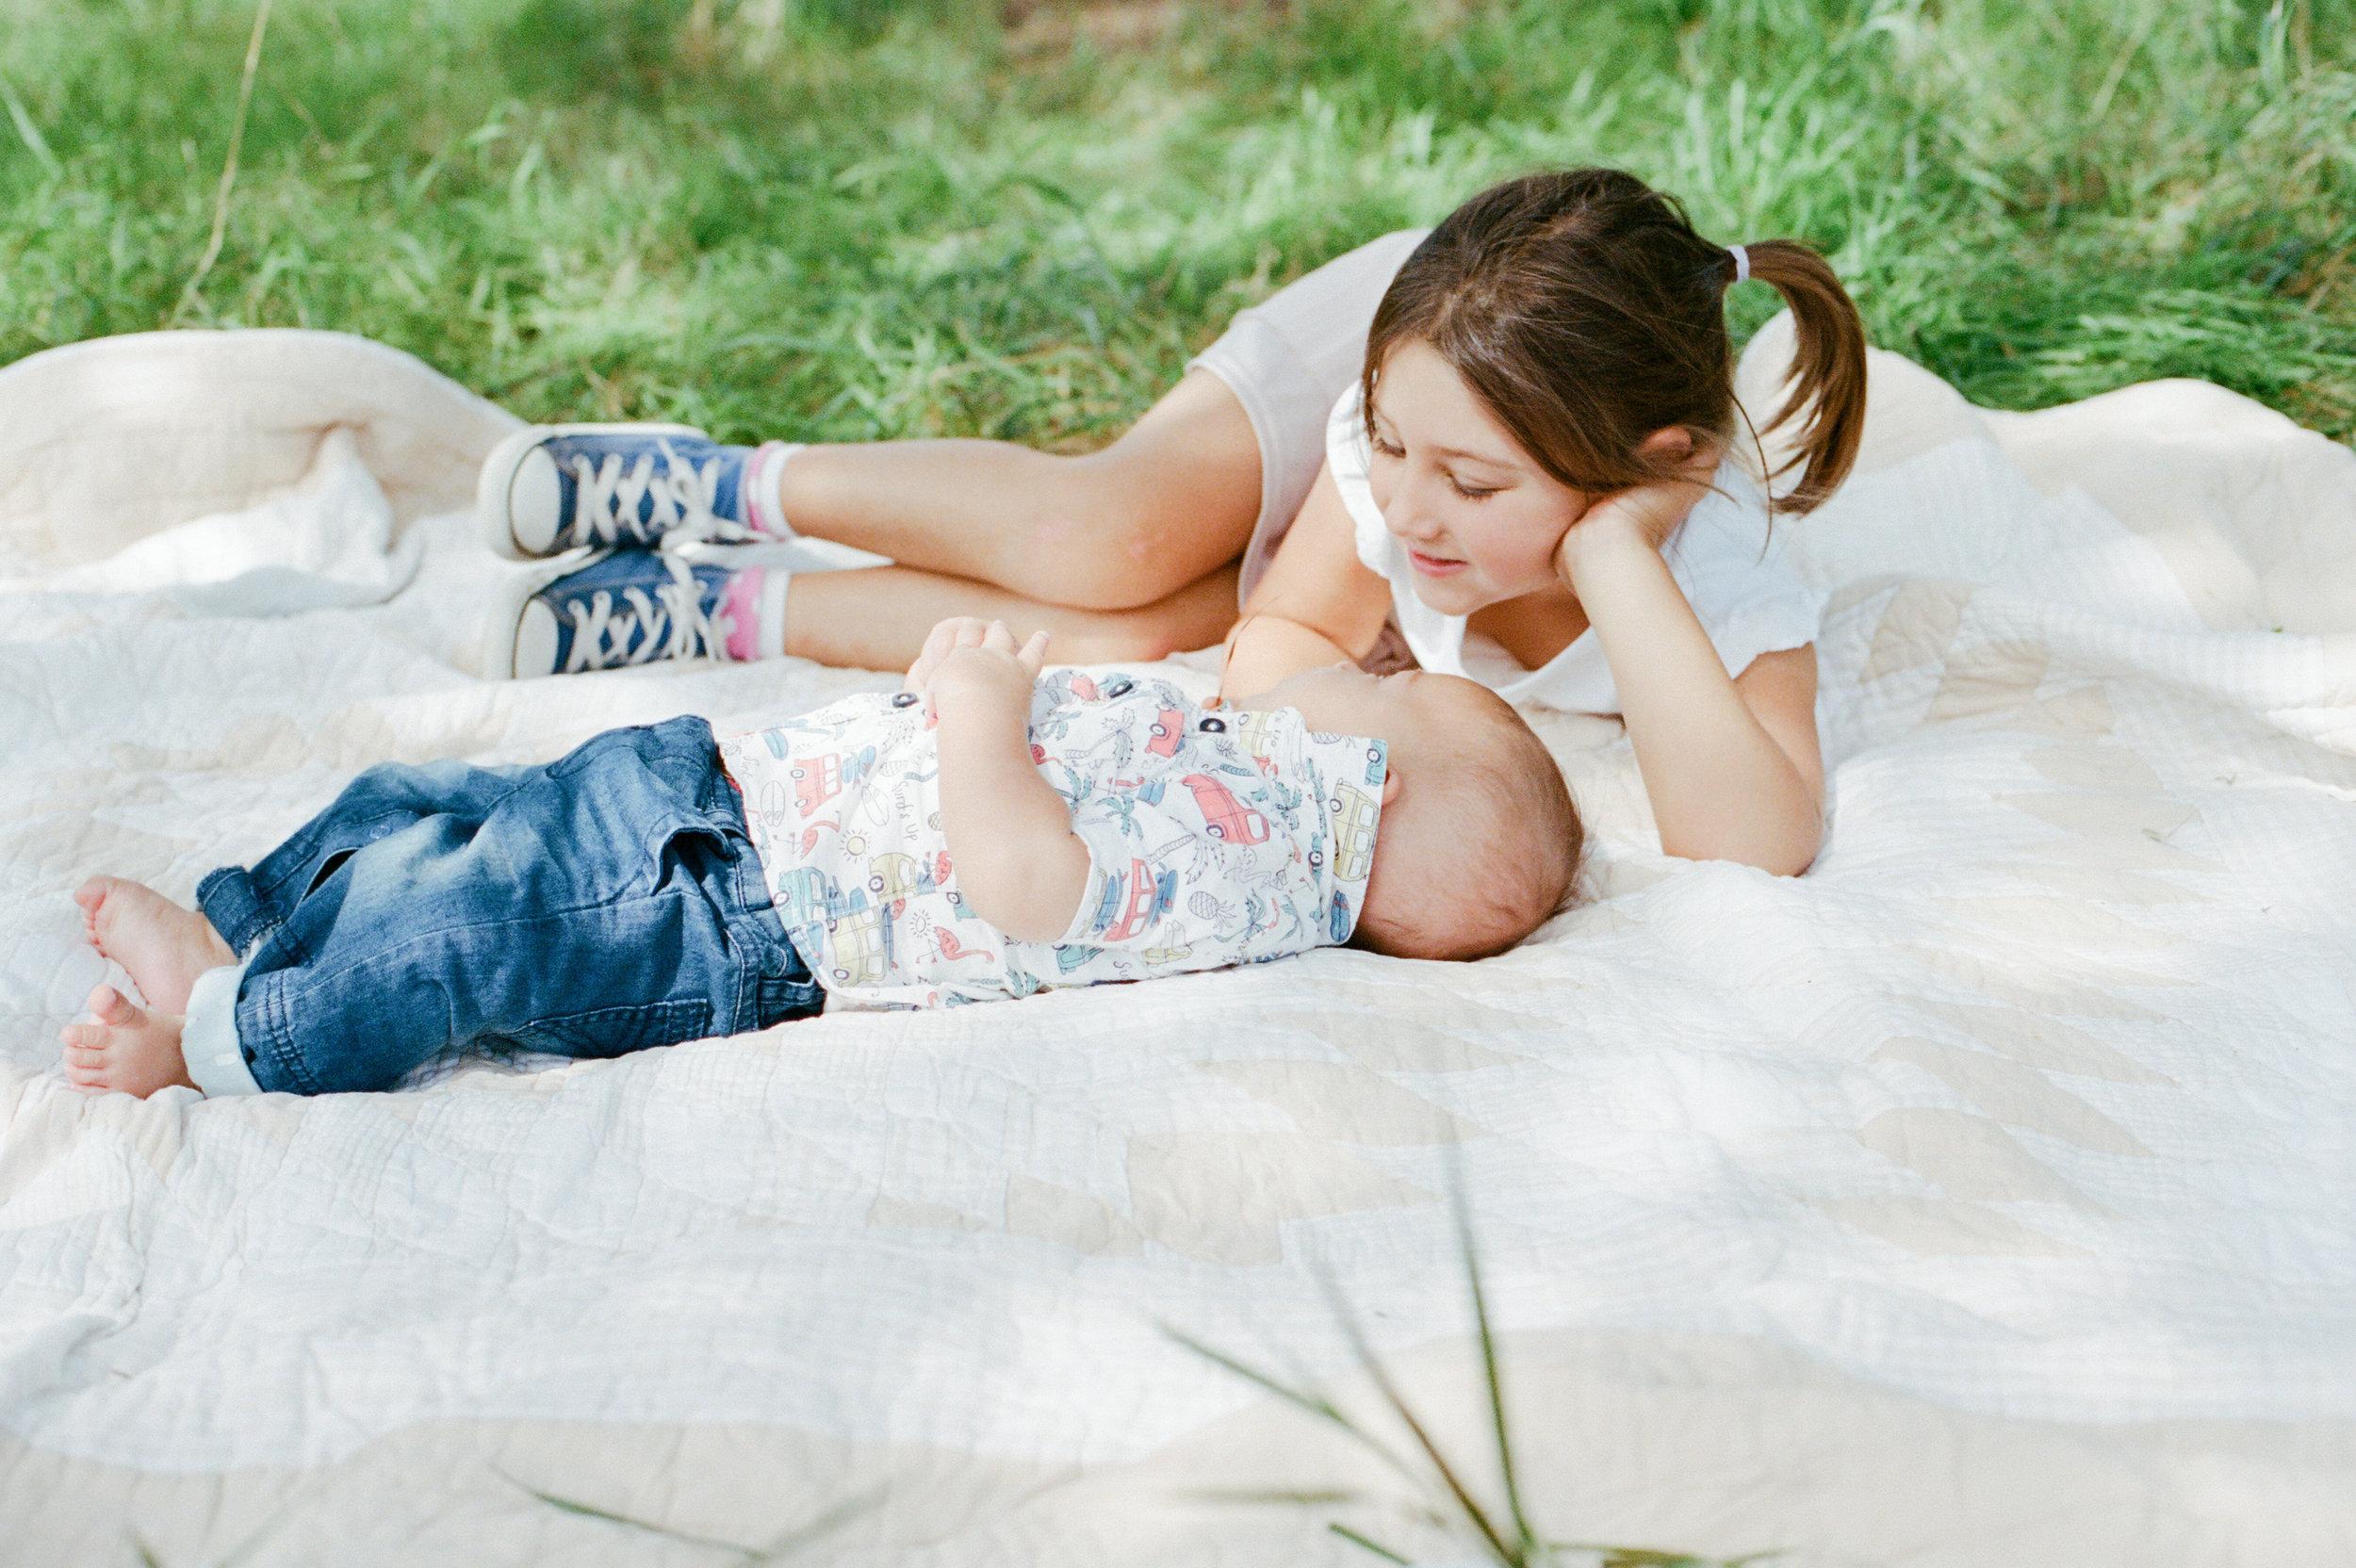 Nicola_London_Family_Photographer-65 copy.jpg